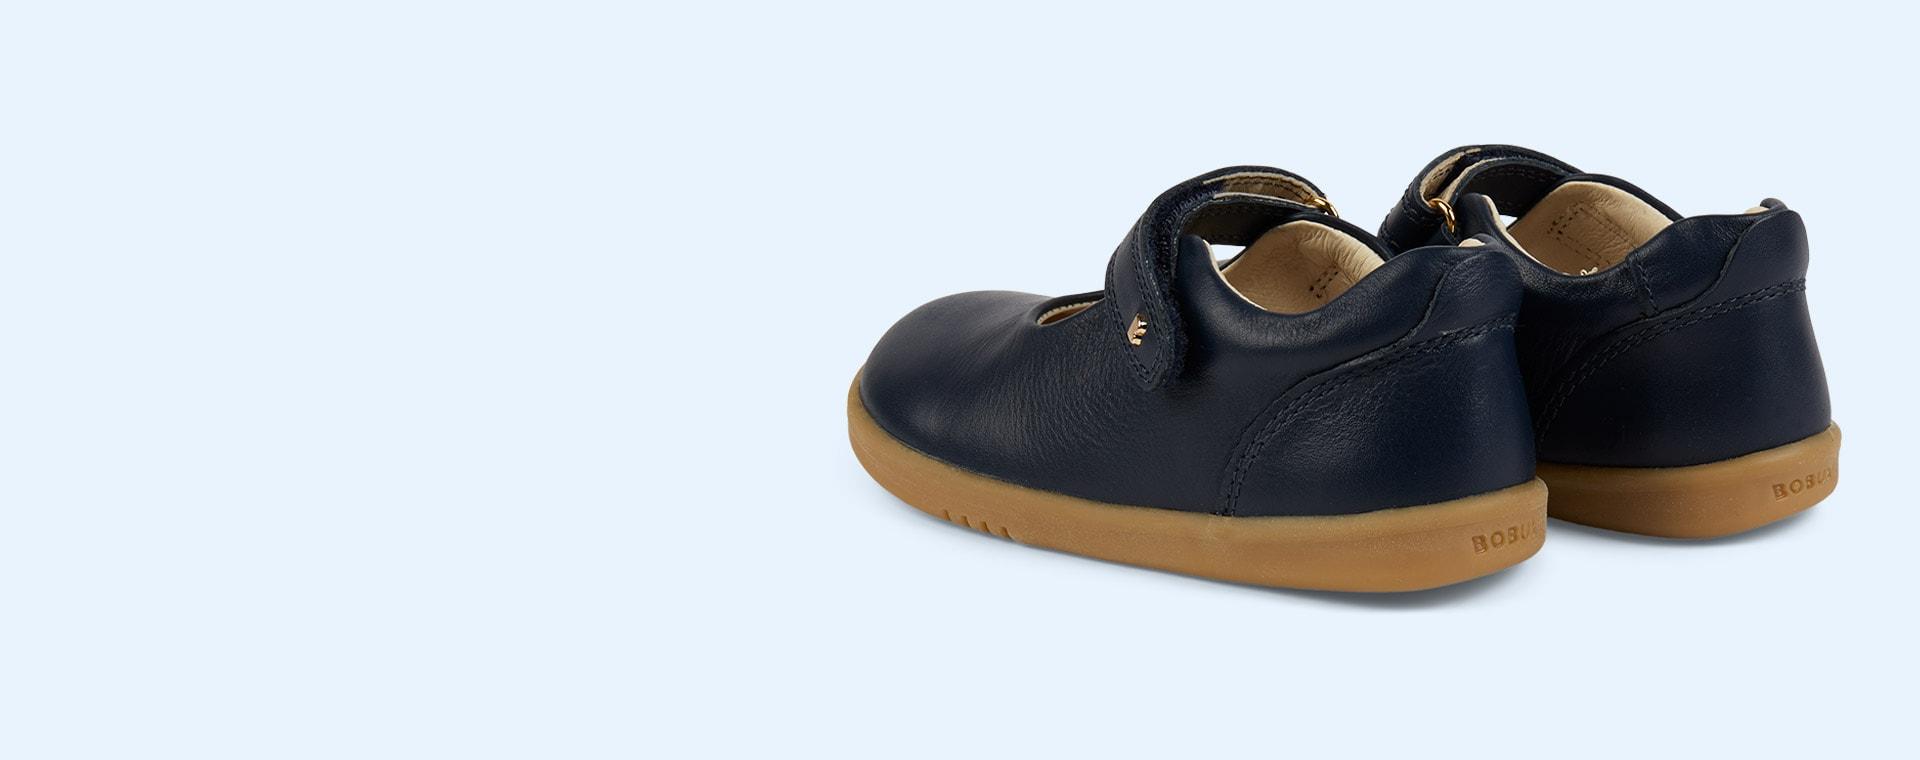 New Navy Bobux I-Walk Delight Mary Jane Shoe